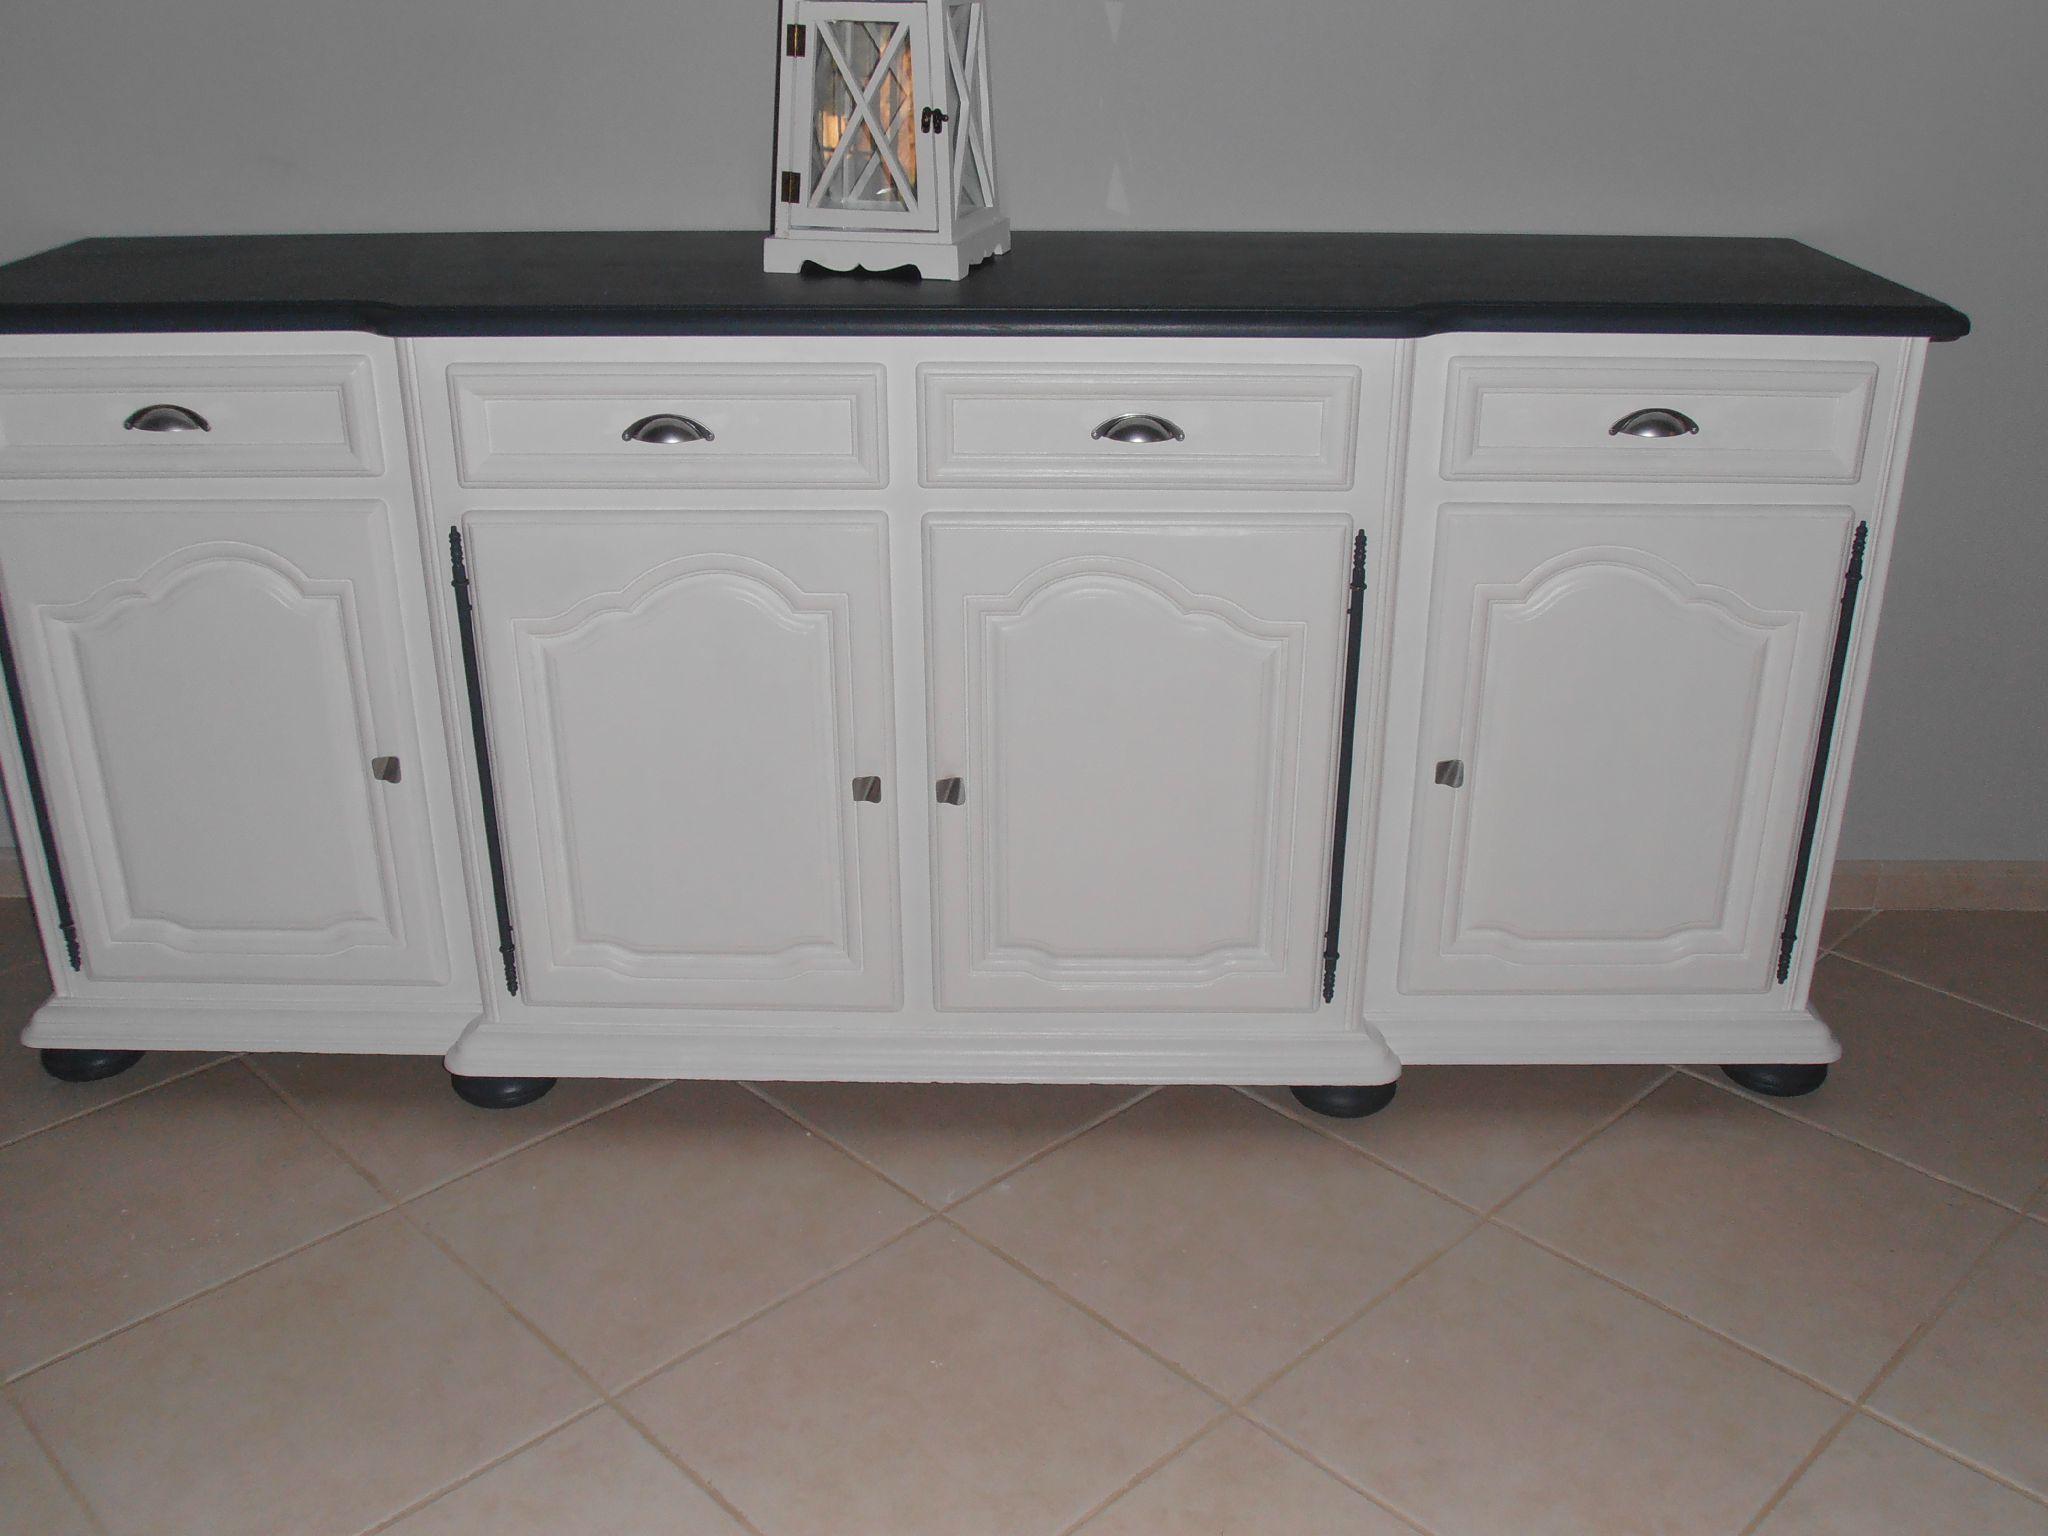 p7300006 meuble repeindre pinterest meuble repeindre meuble et meuble bois. Black Bedroom Furniture Sets. Home Design Ideas